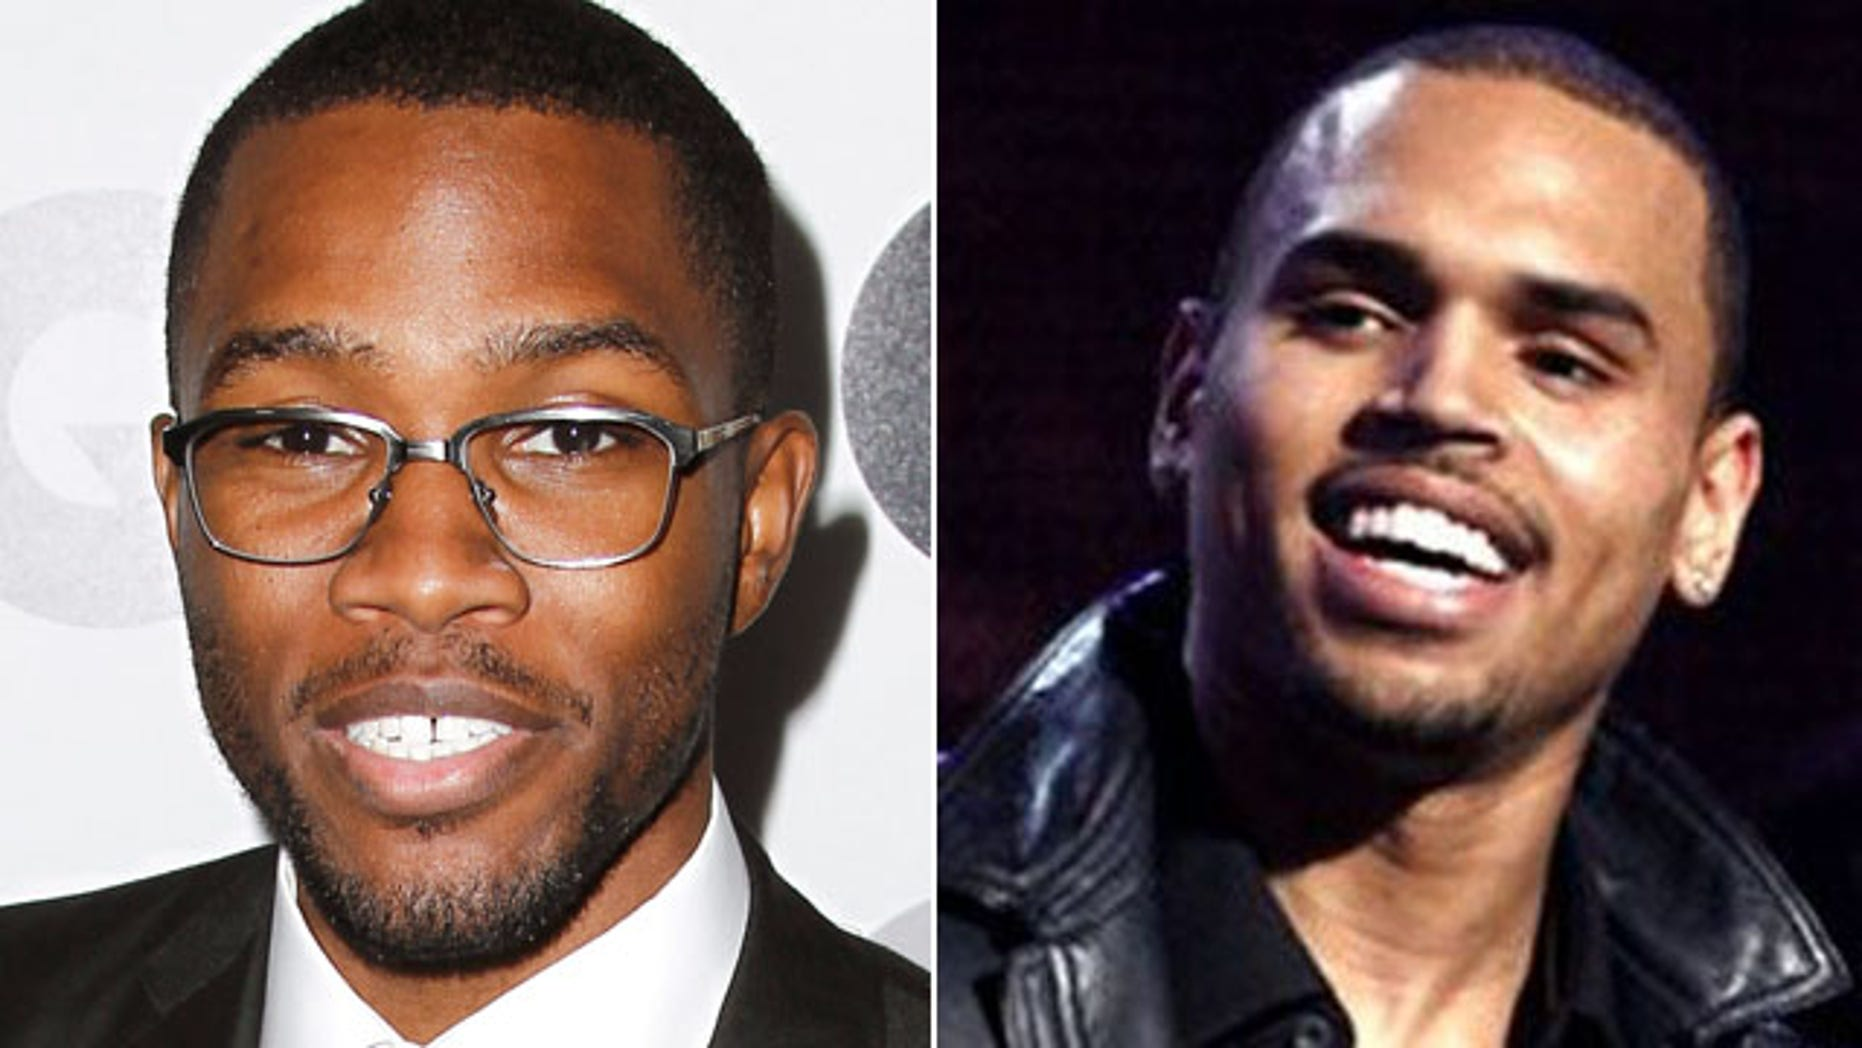 Frank Ocean, left, and Chris Brown.